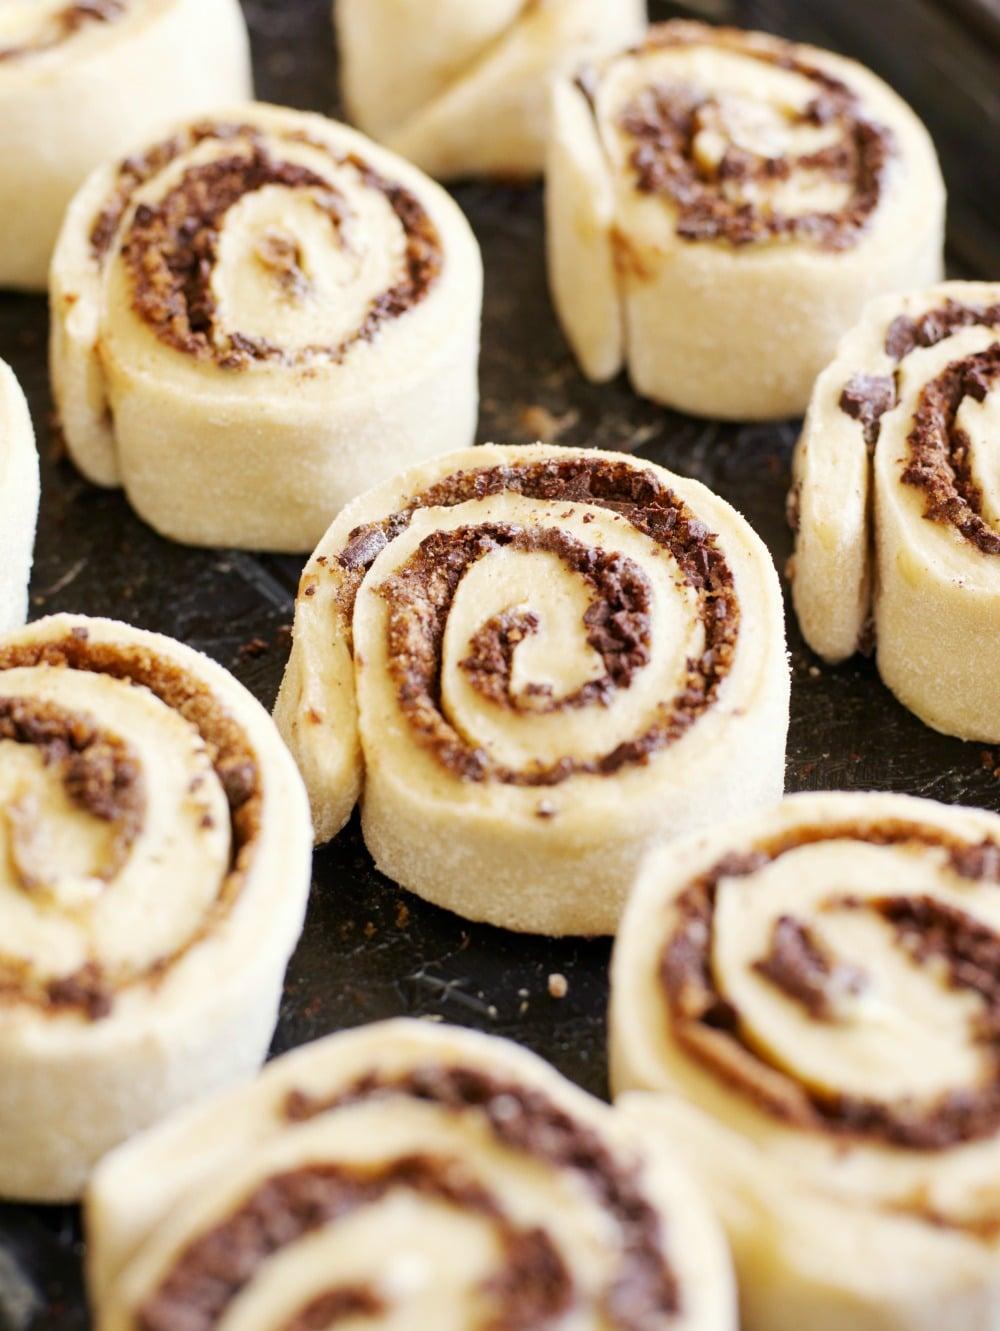 Chocolate Cinnamon Roll Recipe